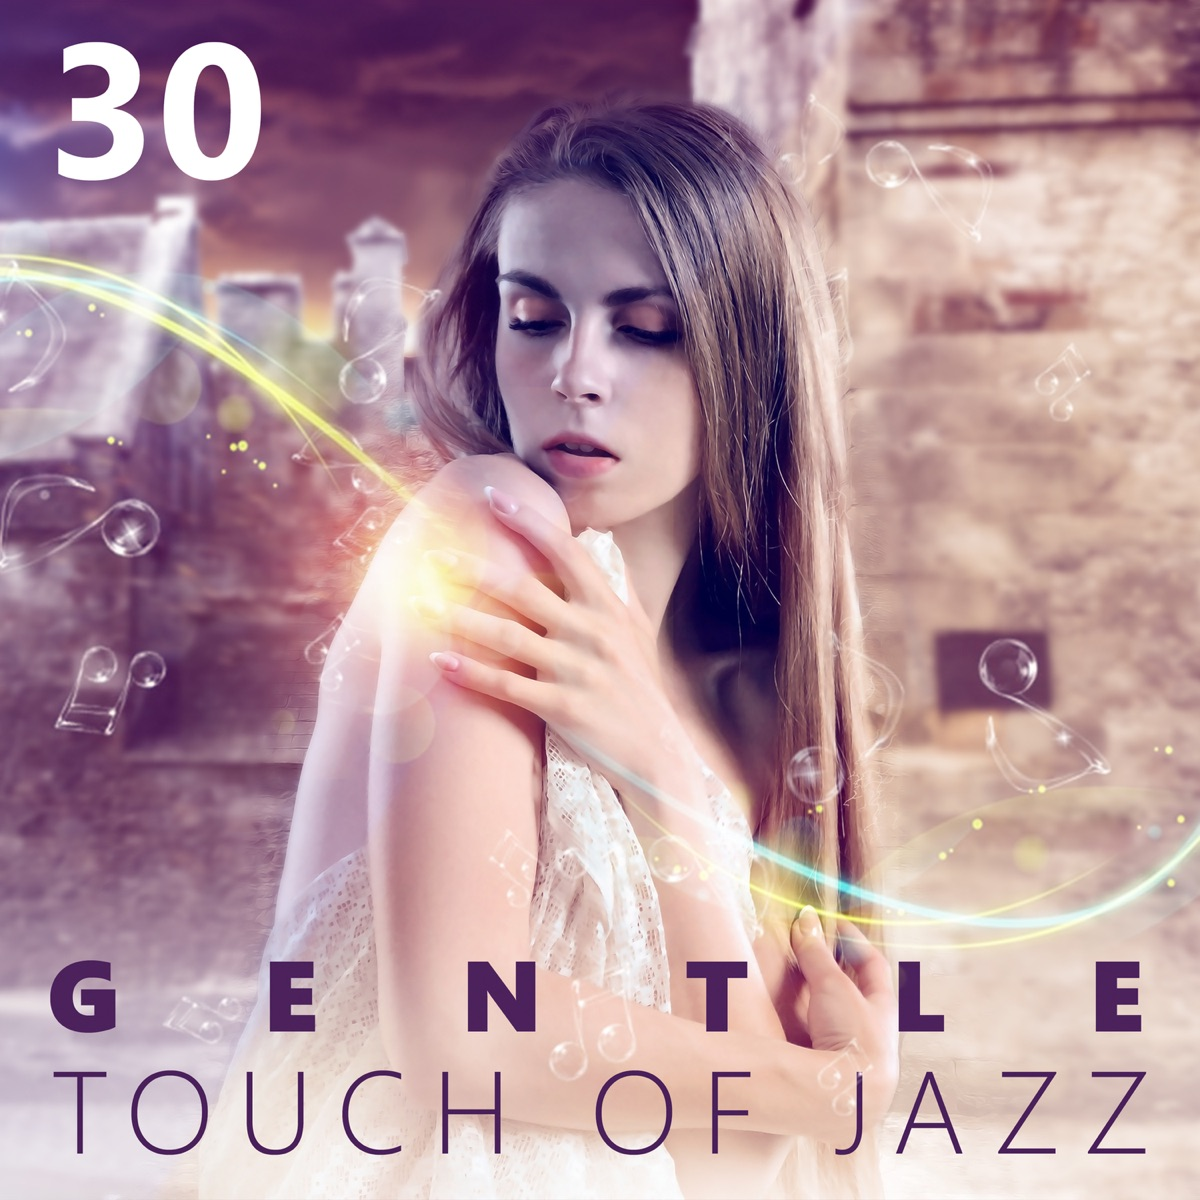 30 Gentle Touch of Jazz: Easy Listening Restaurant Music